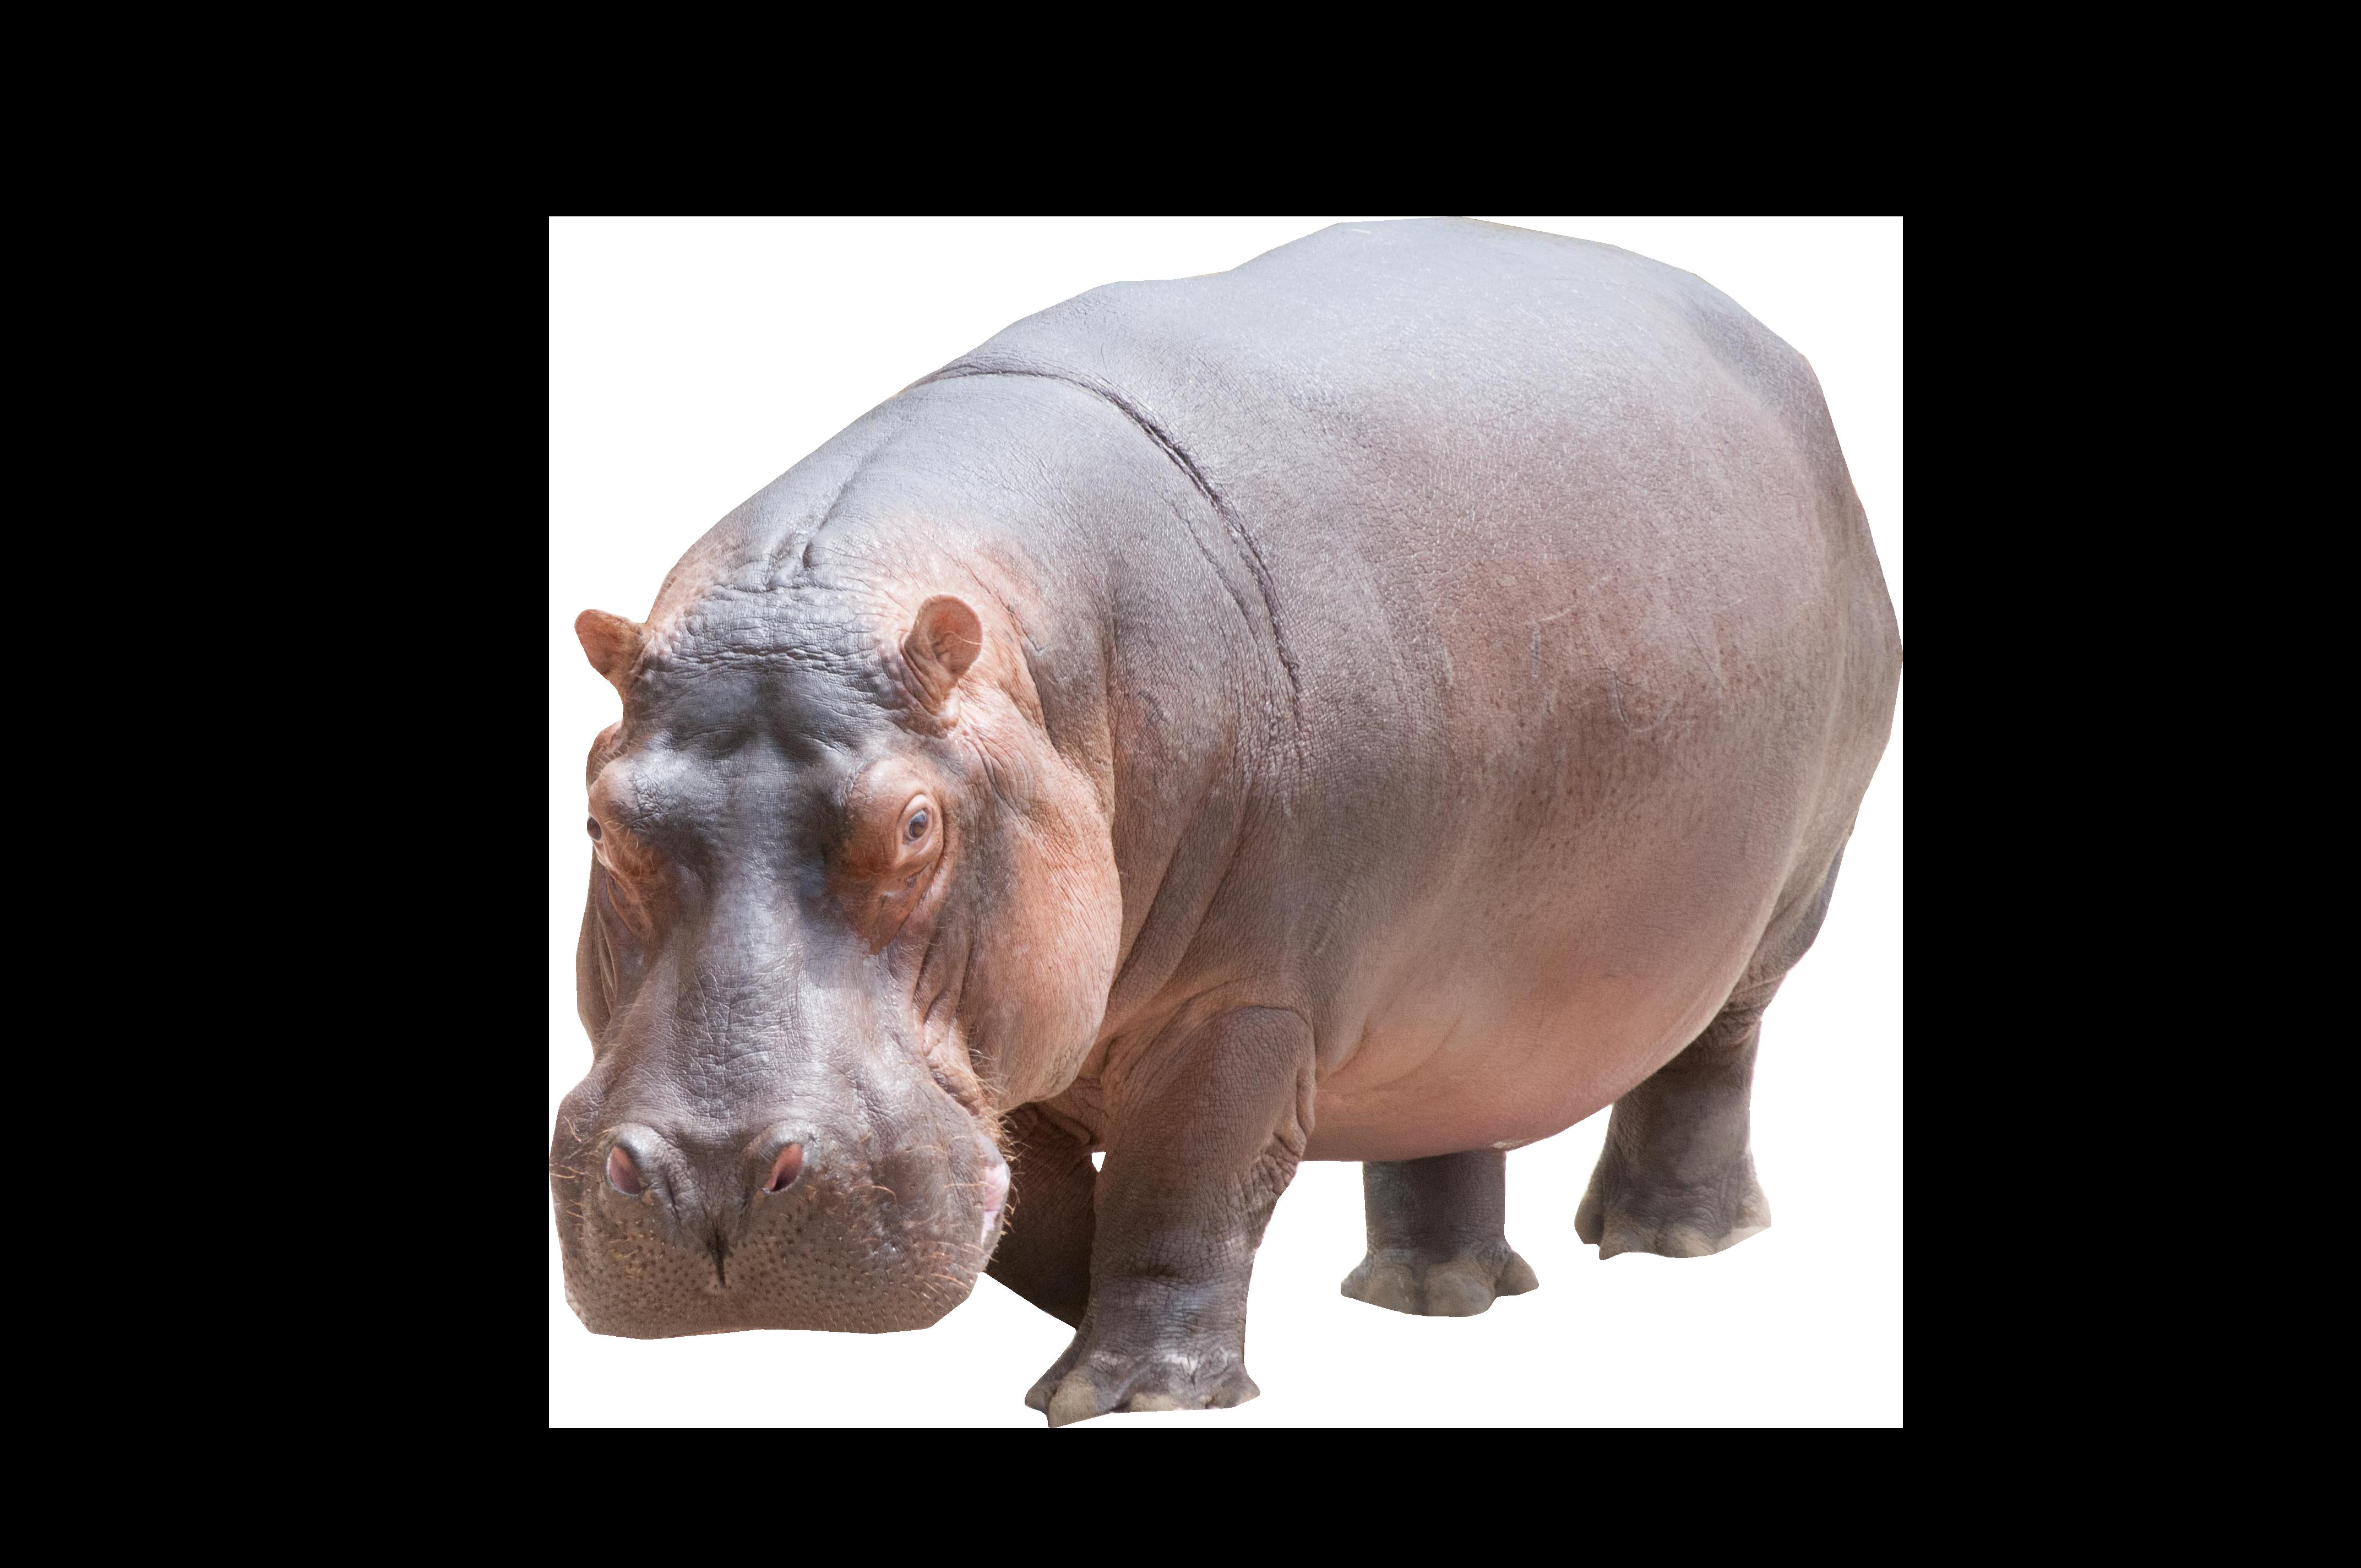 Hippo png image purepng. Hippopotamus clipart transparent background